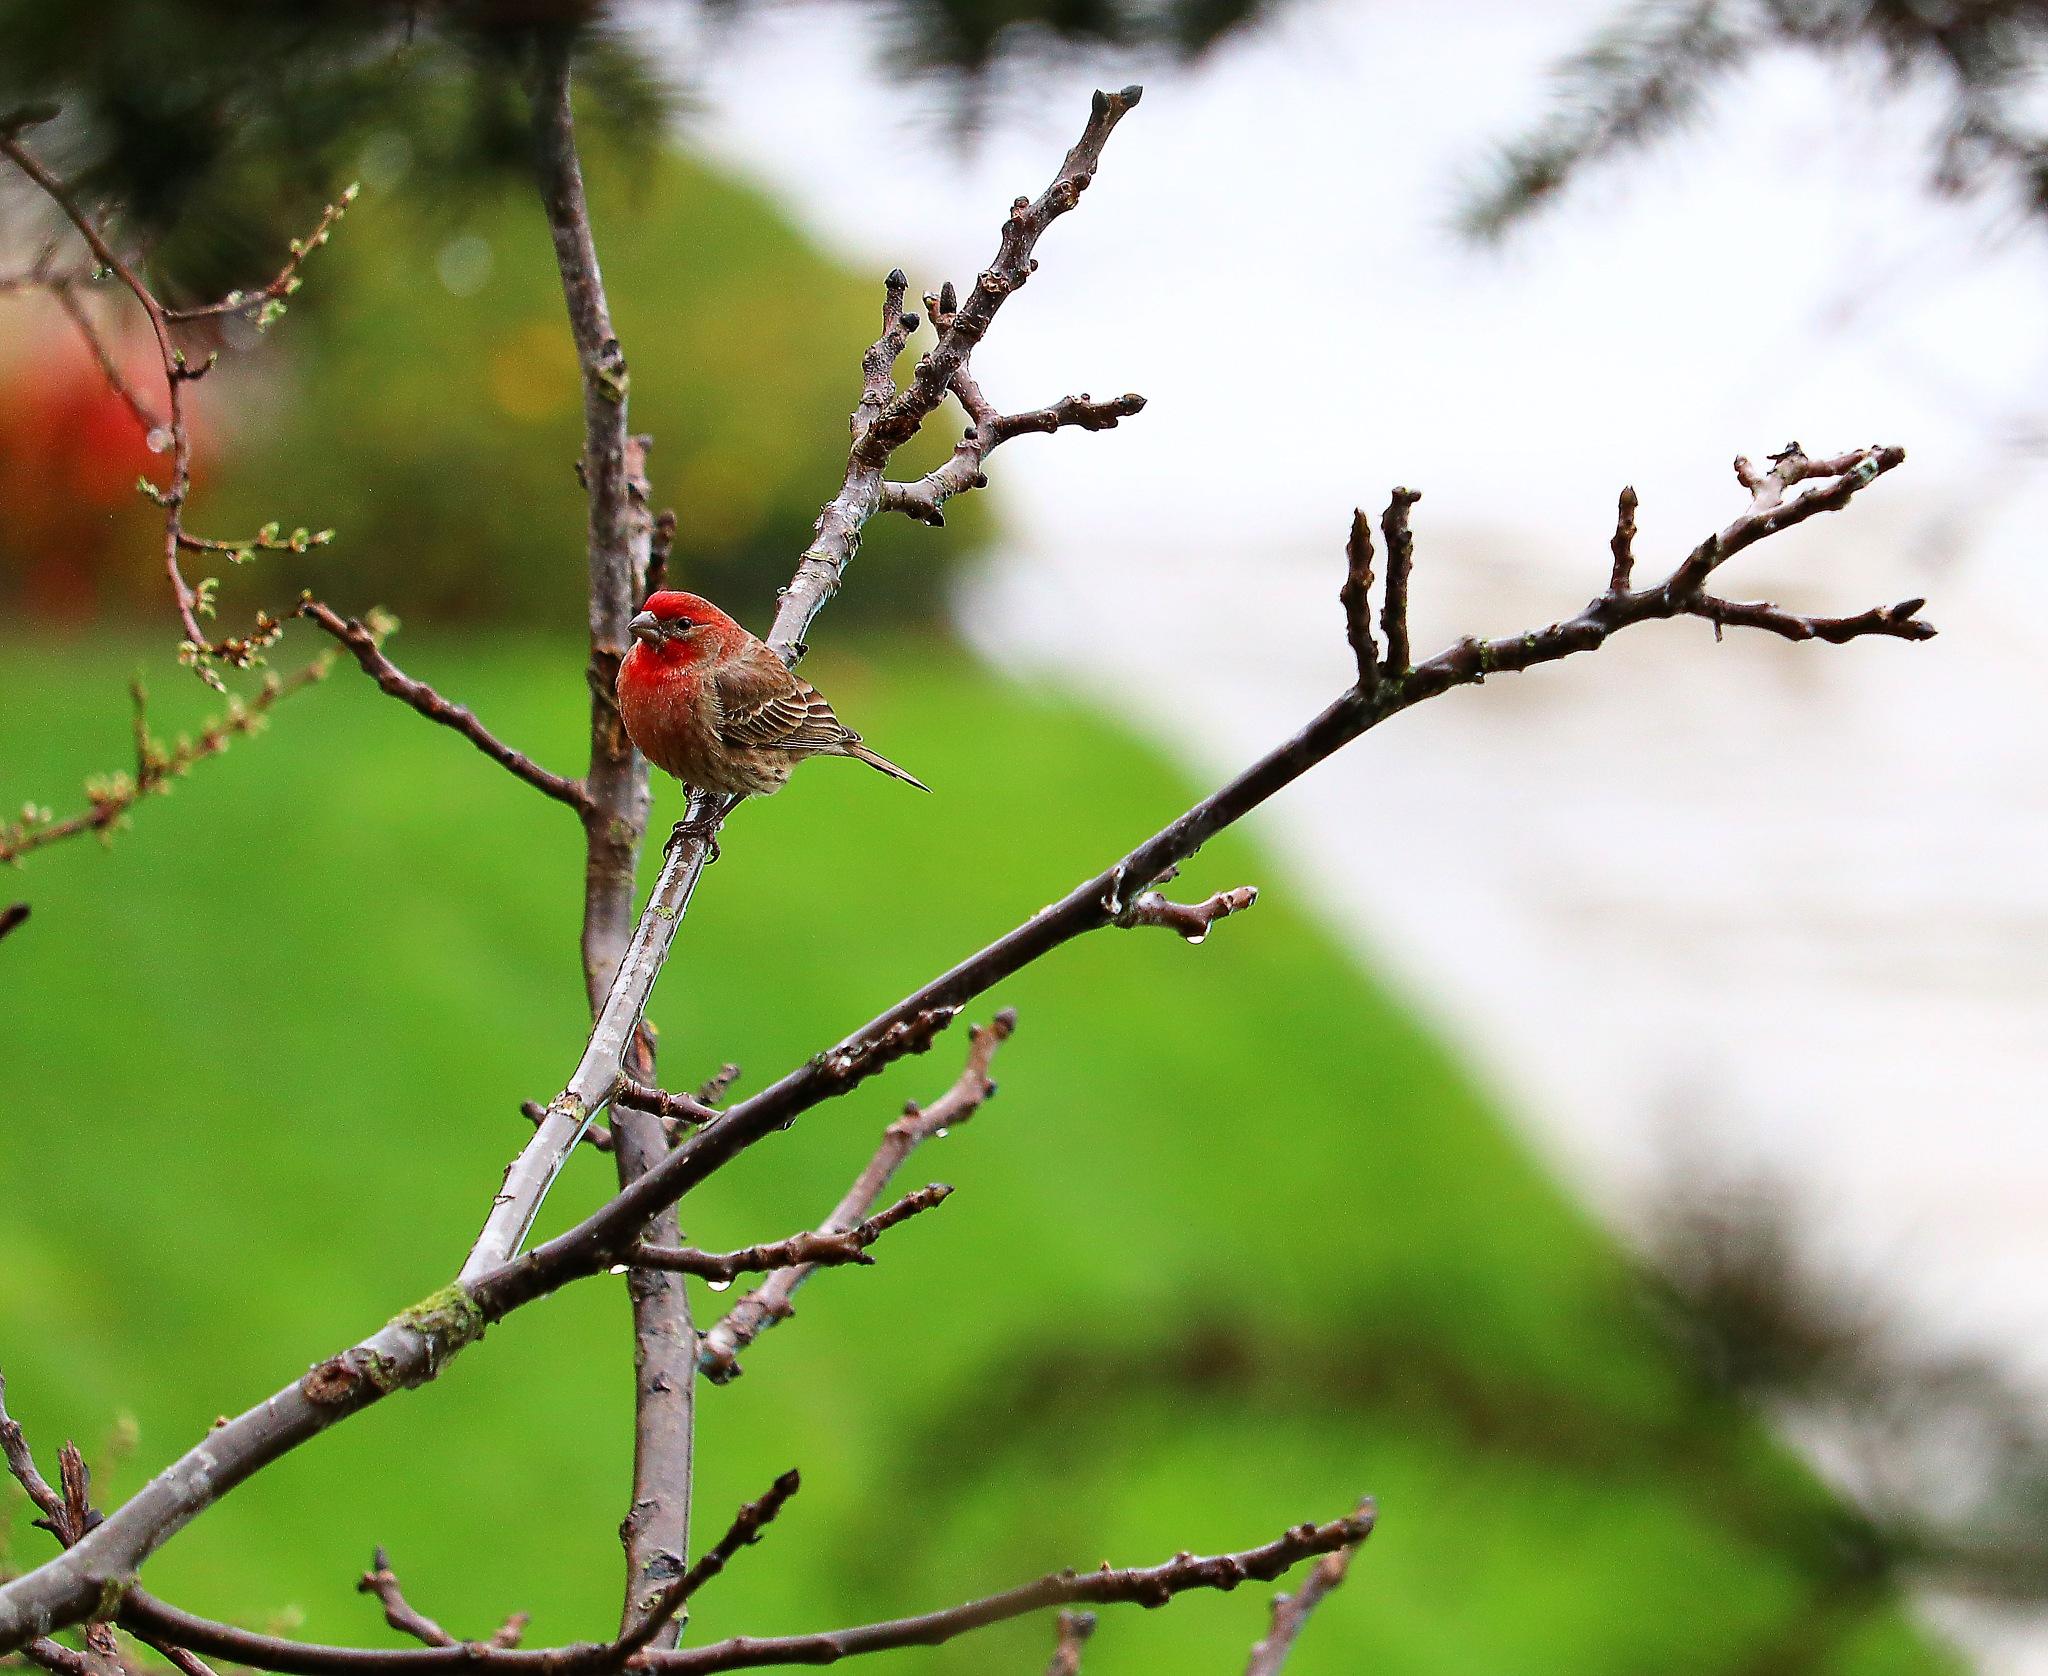 Chickadee in the Rain by Robert Atkinson